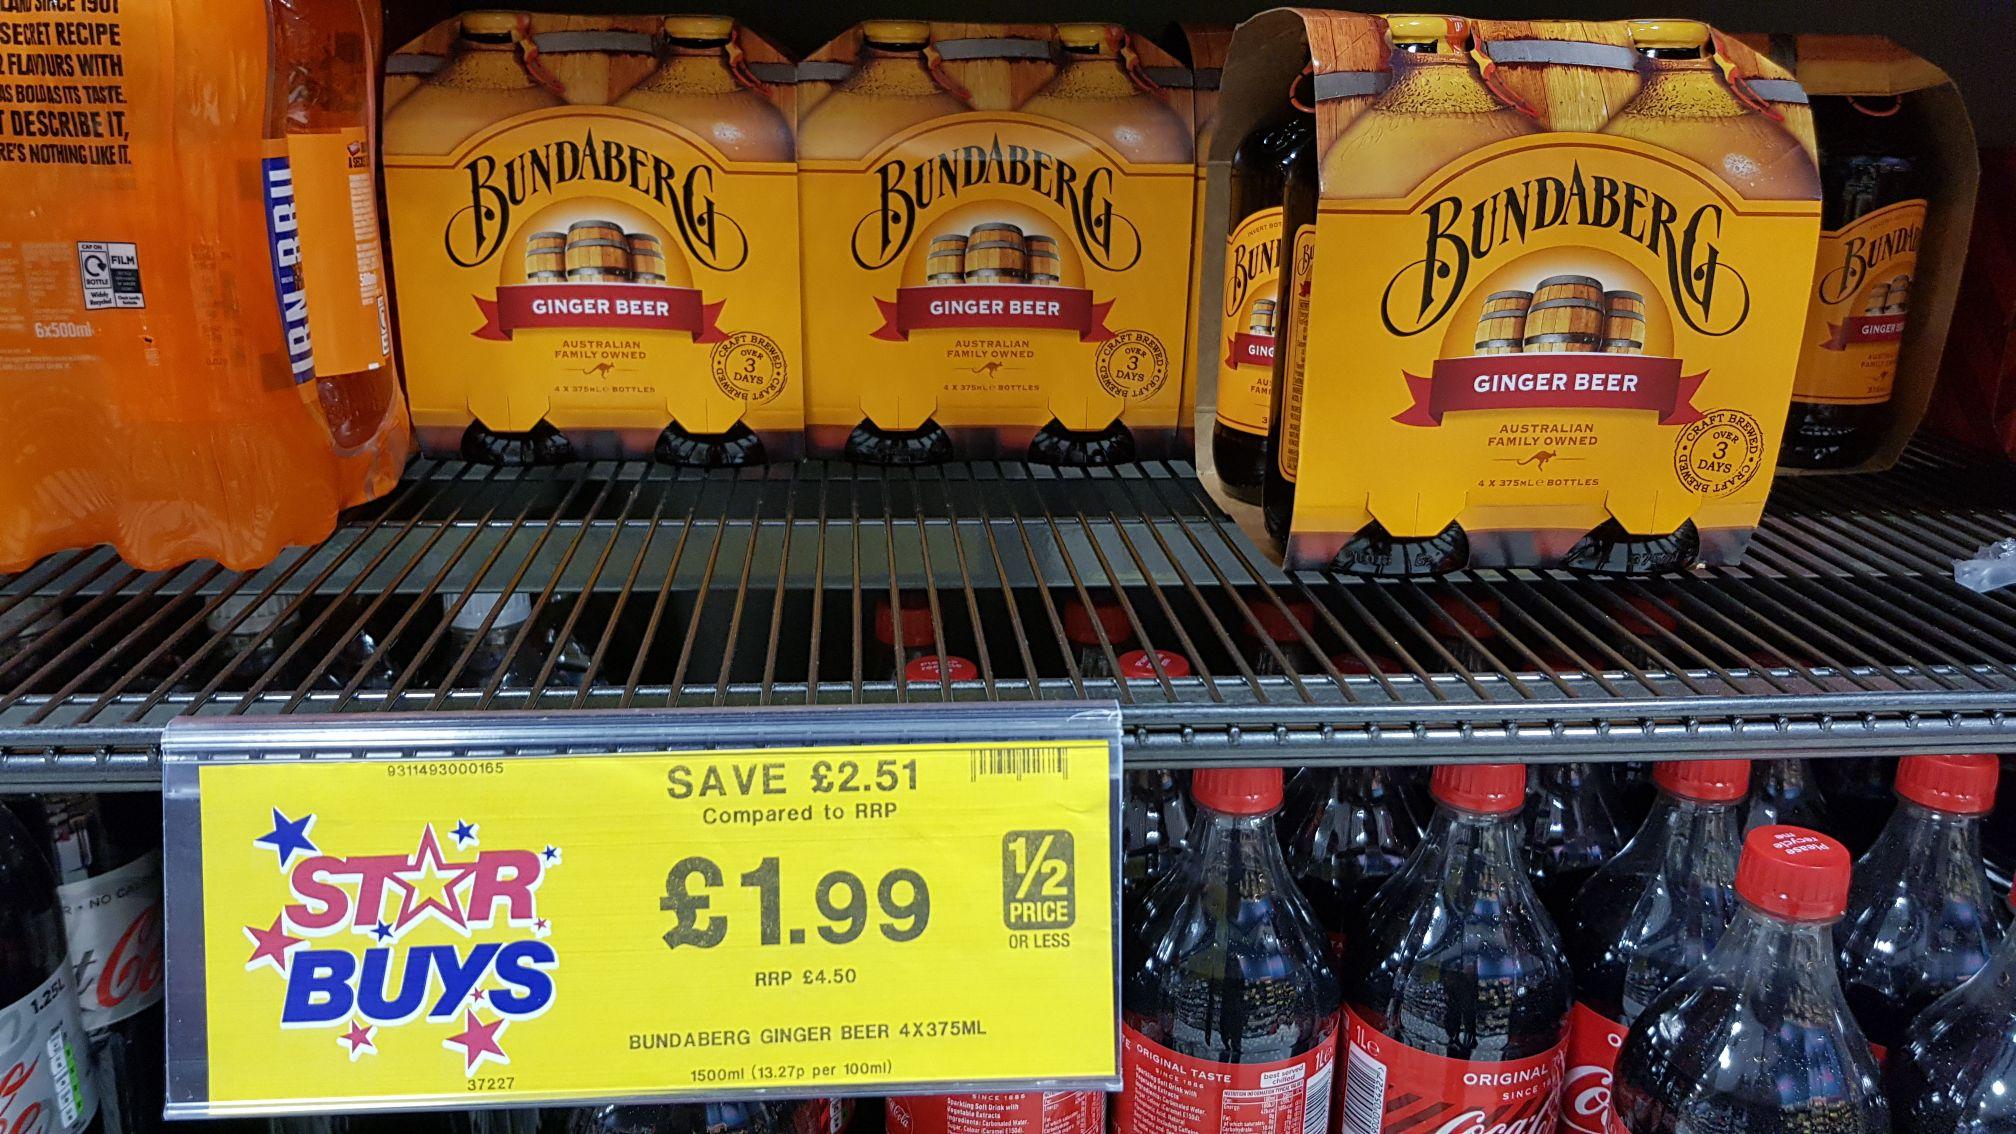 Bundaberg Ginger Beer 4x375ml £1.99 @ Home Bargains